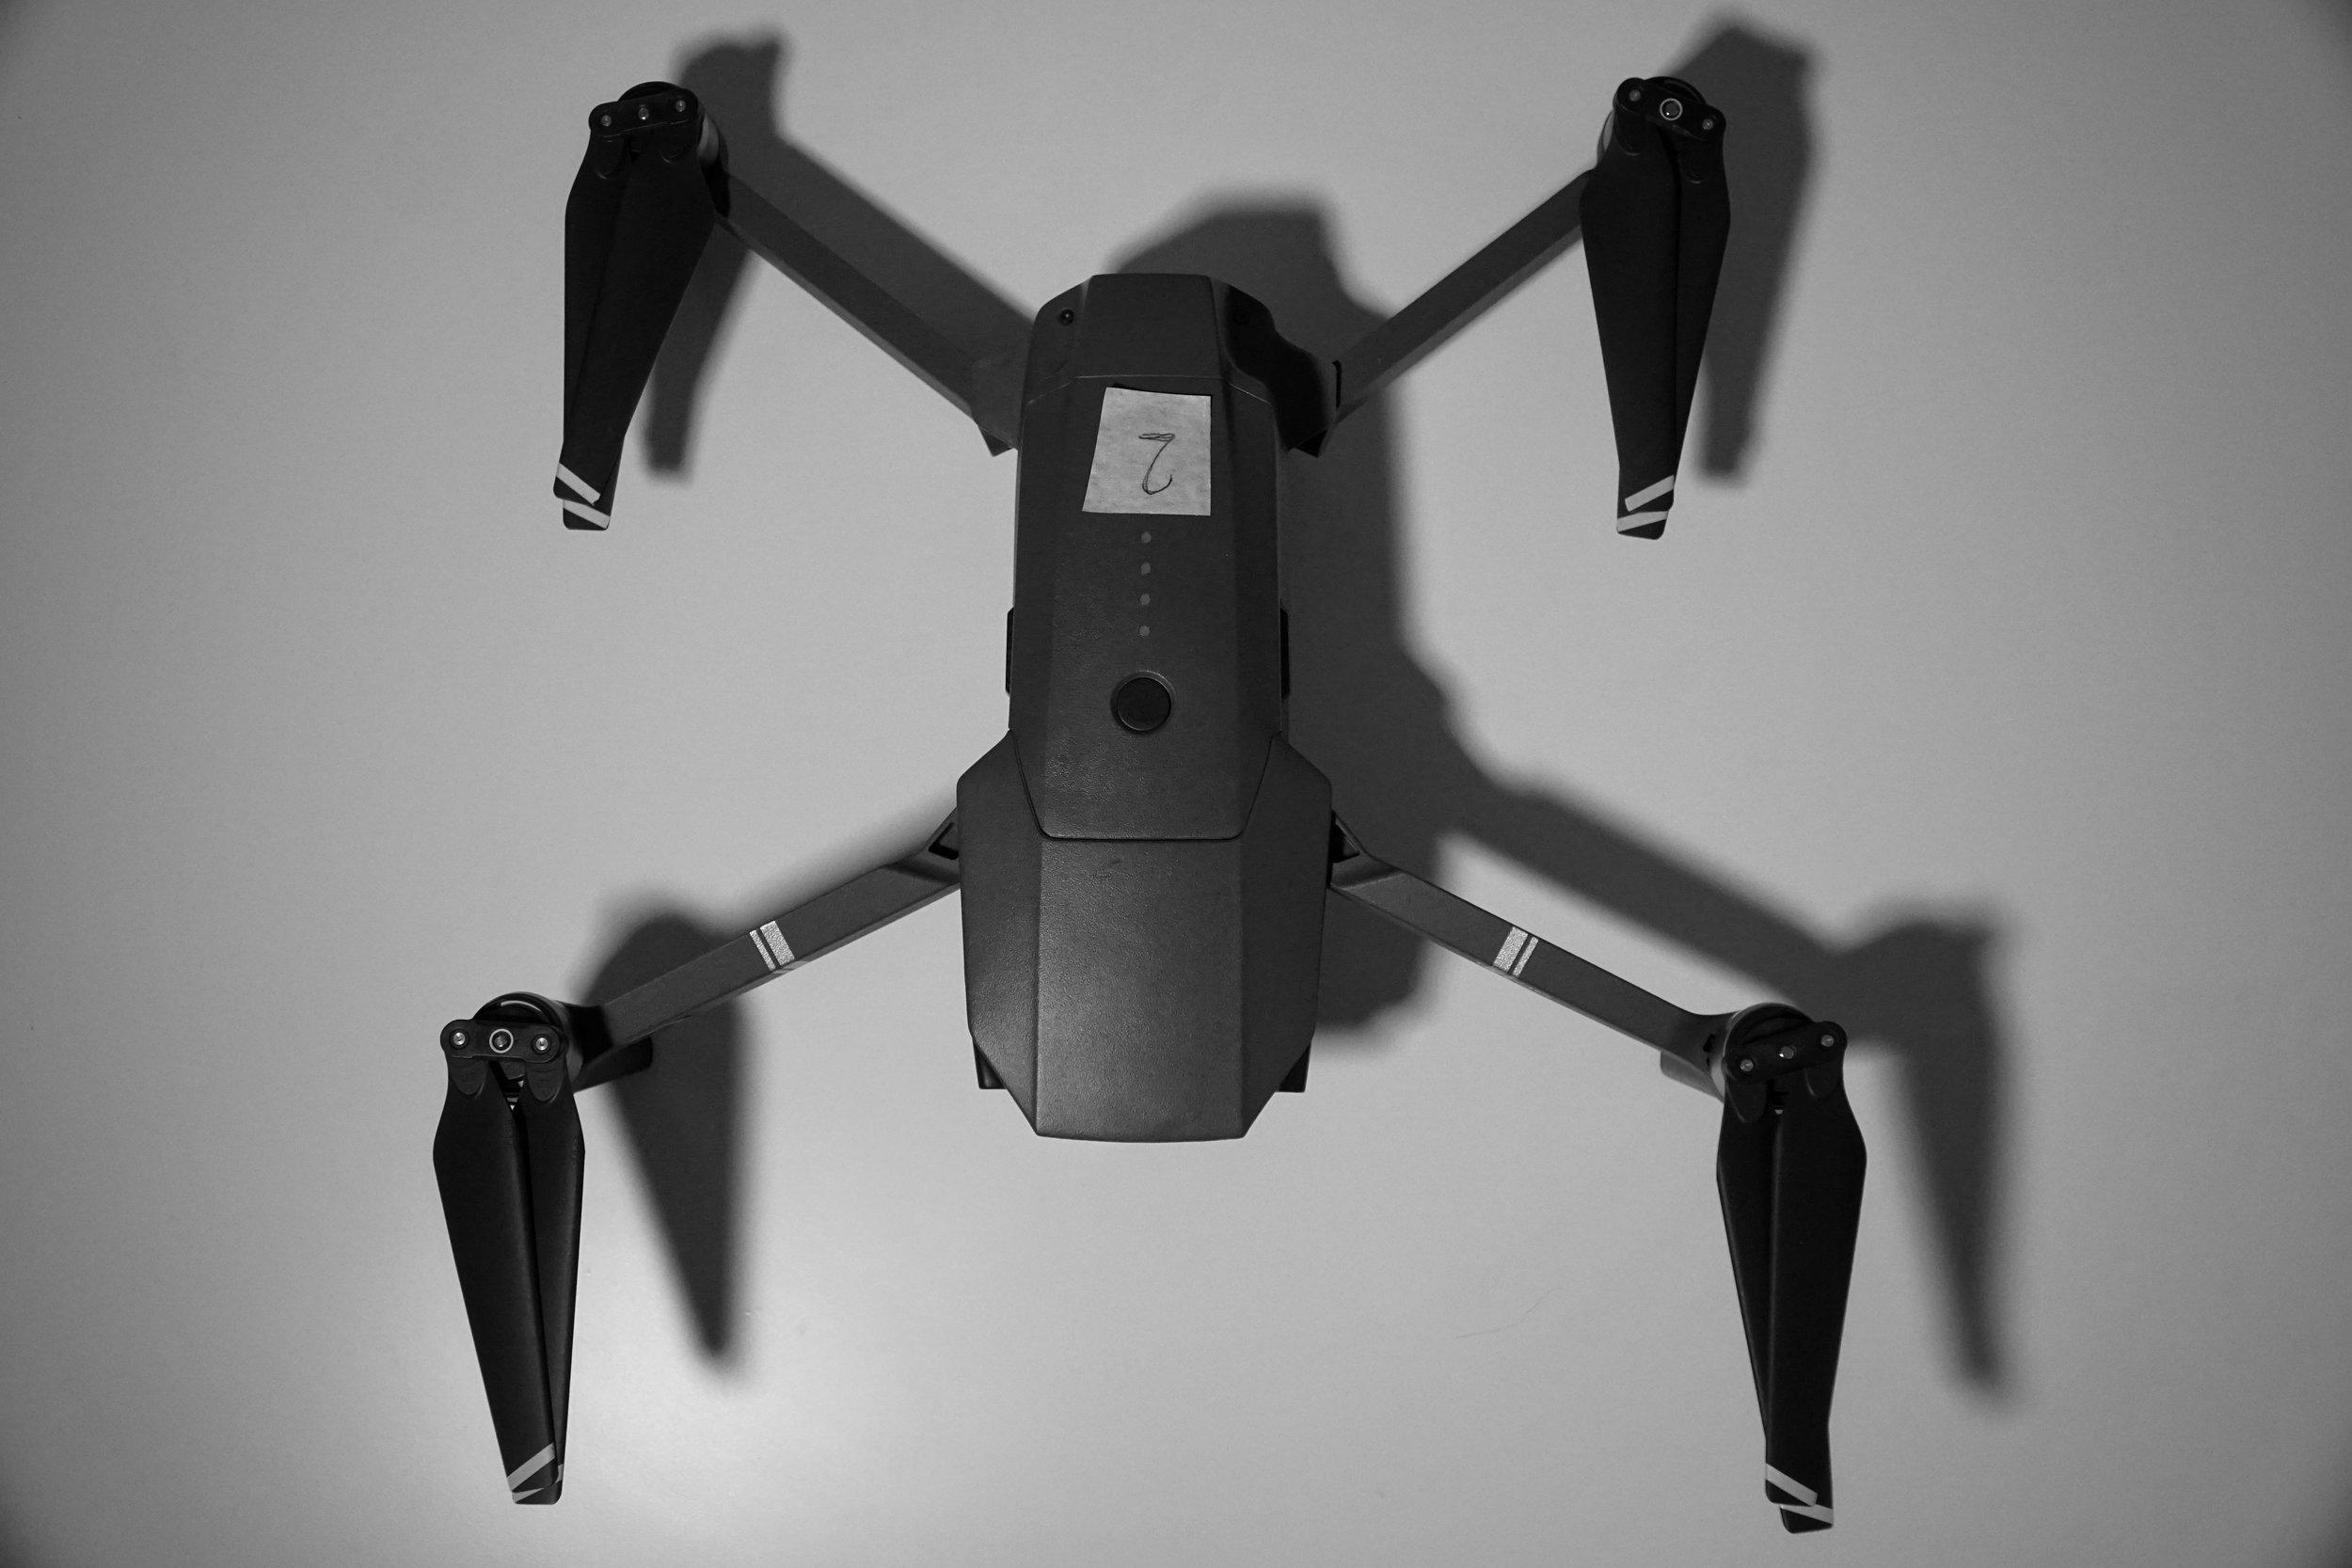 DJI Mavic Pro - Professional Drone -